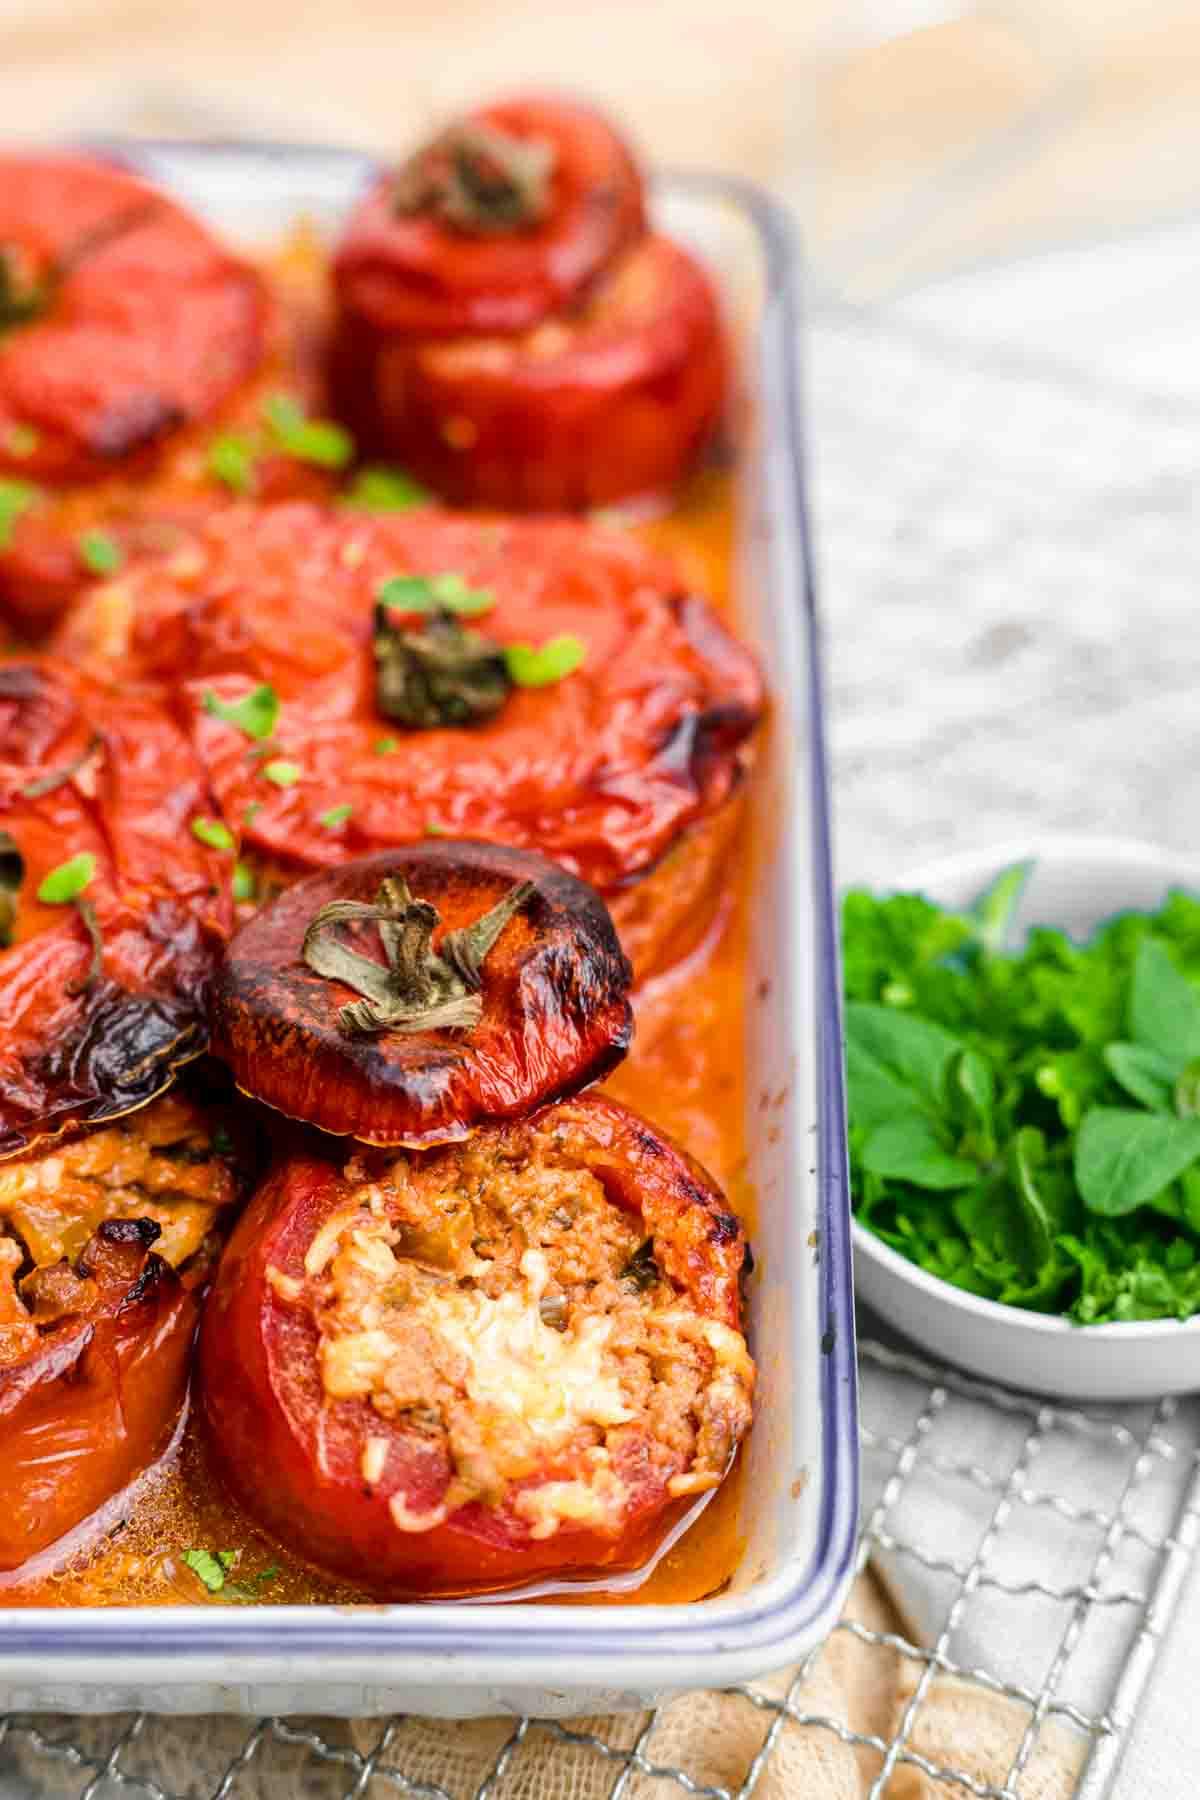 Stuffed Tomatoes Recipe fully baked